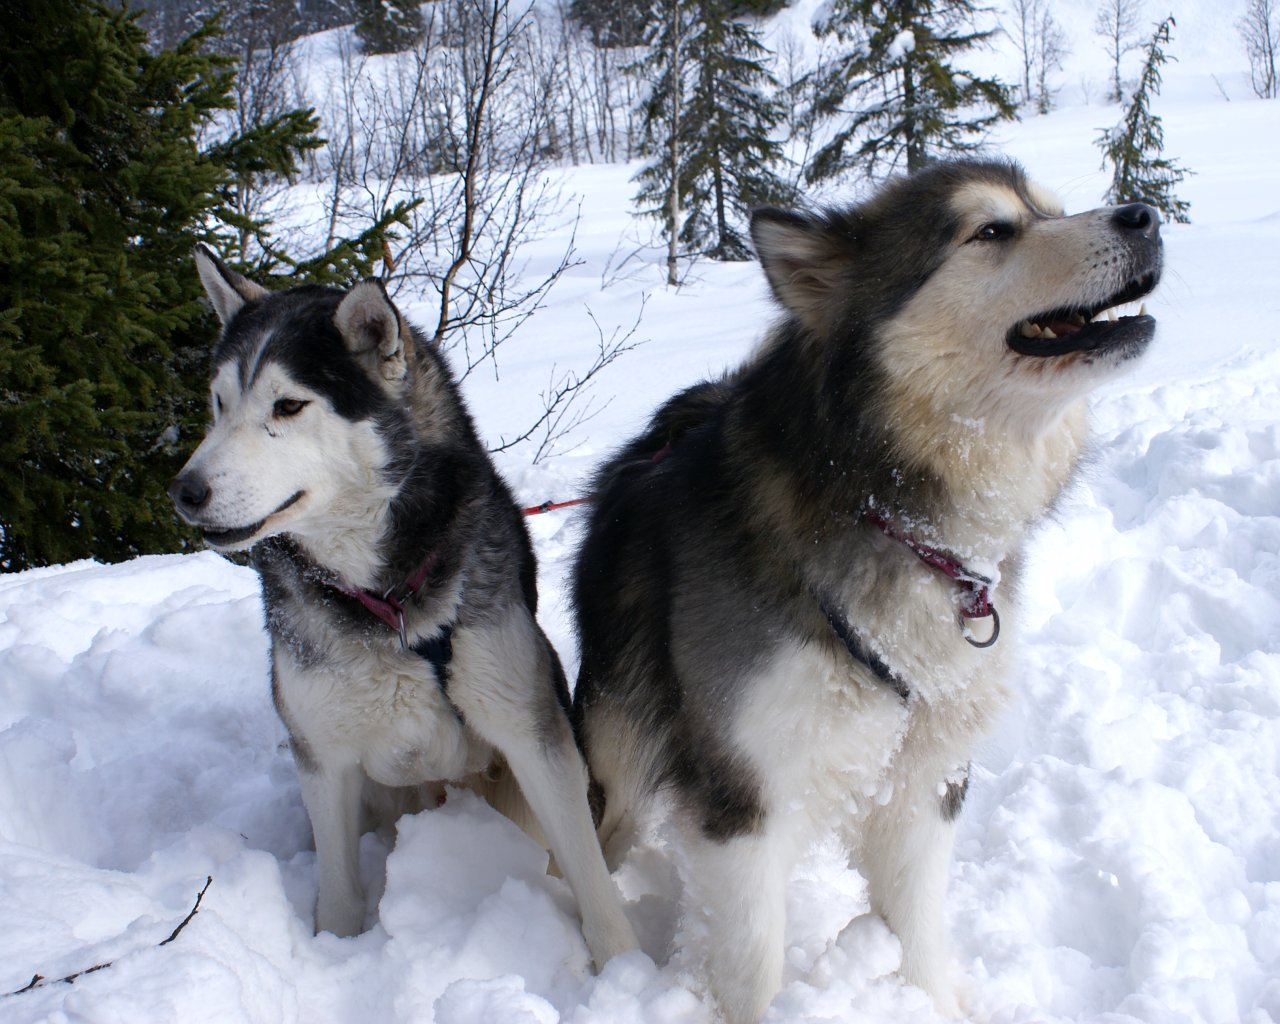 Siberian Husky dogs in the snow wallpaper 1280x1024